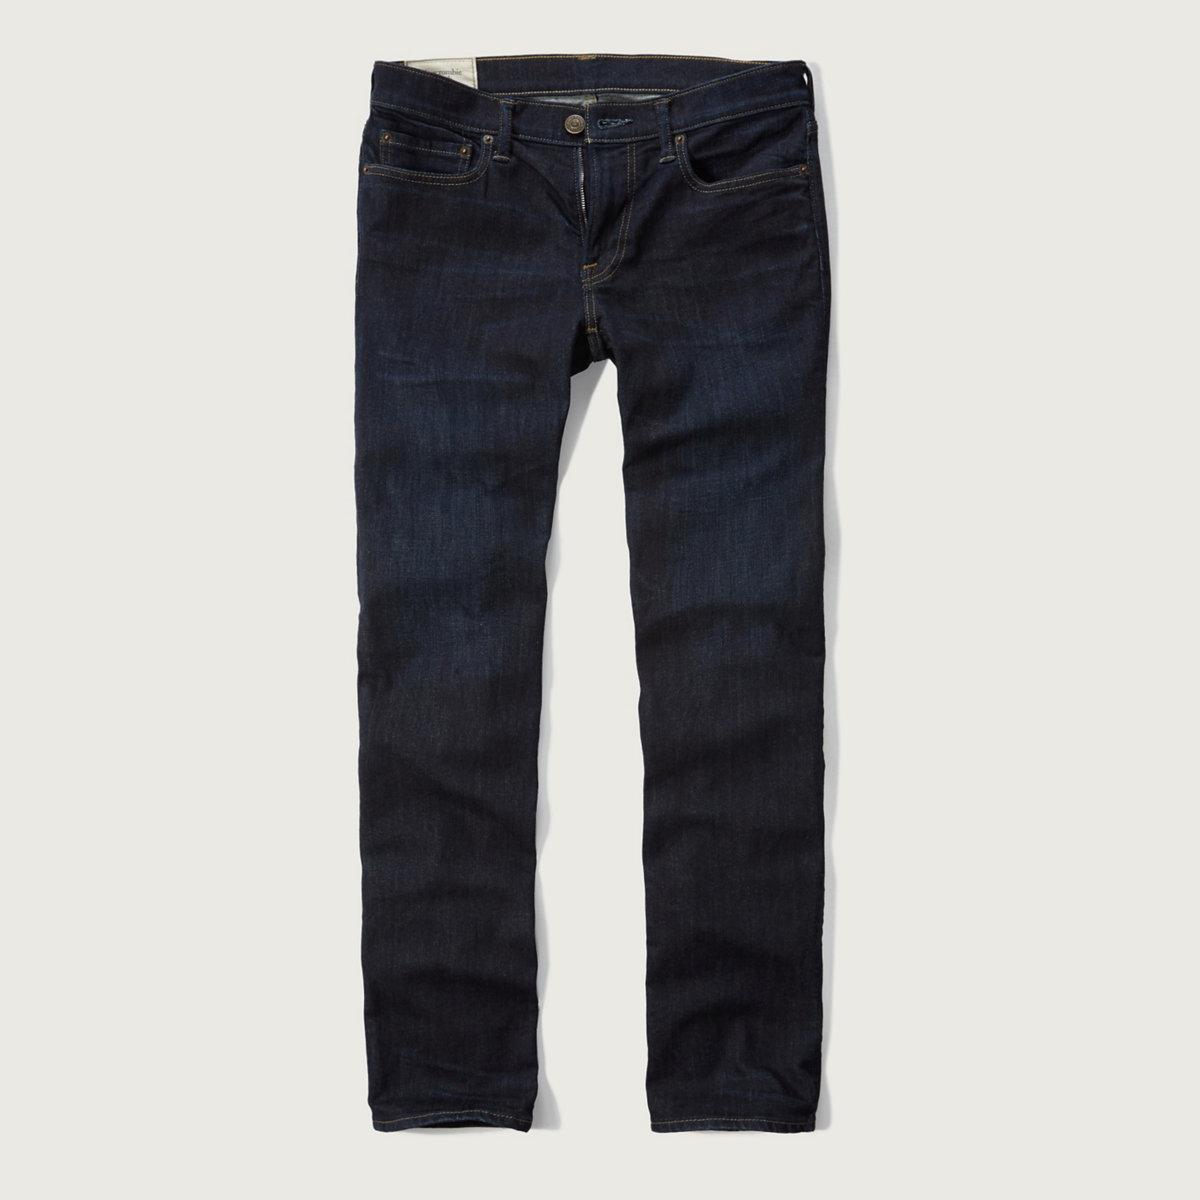 Slim Straight Everyday Stretch Jeans